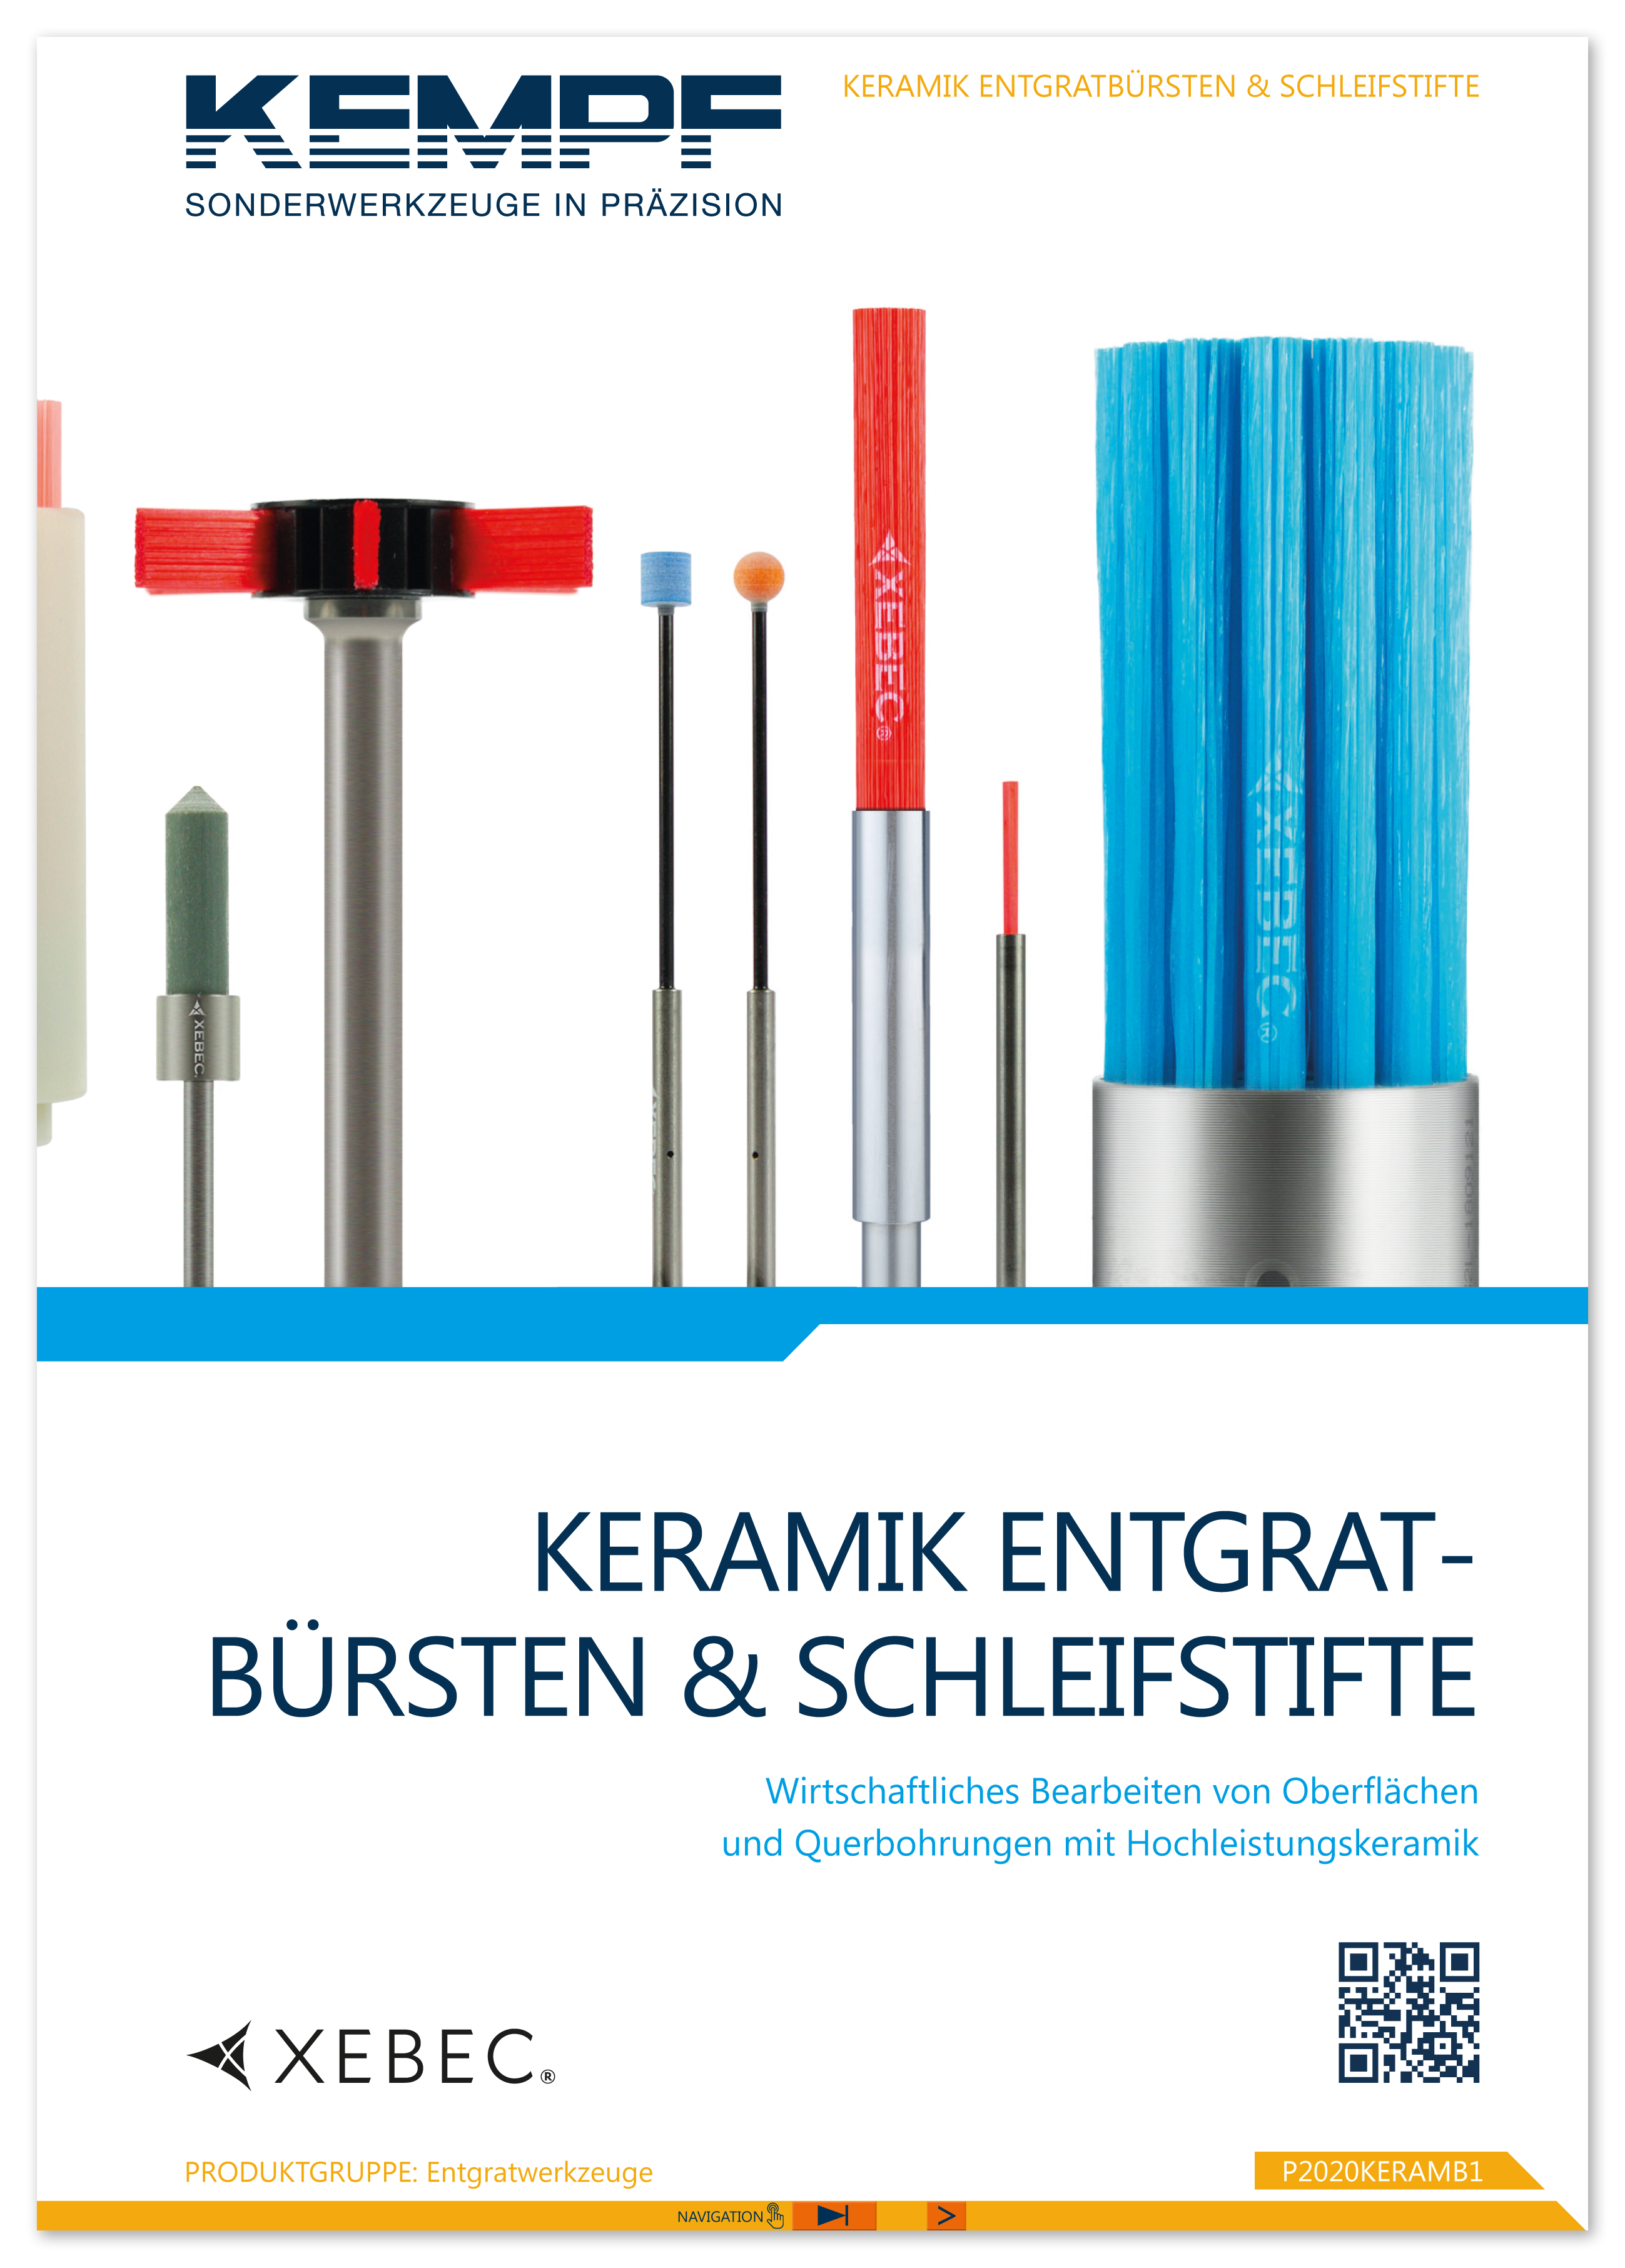 ENTGRATEN-Keramik-Entgratb-rsten-SchleifstifteP2020KERAMB1_1